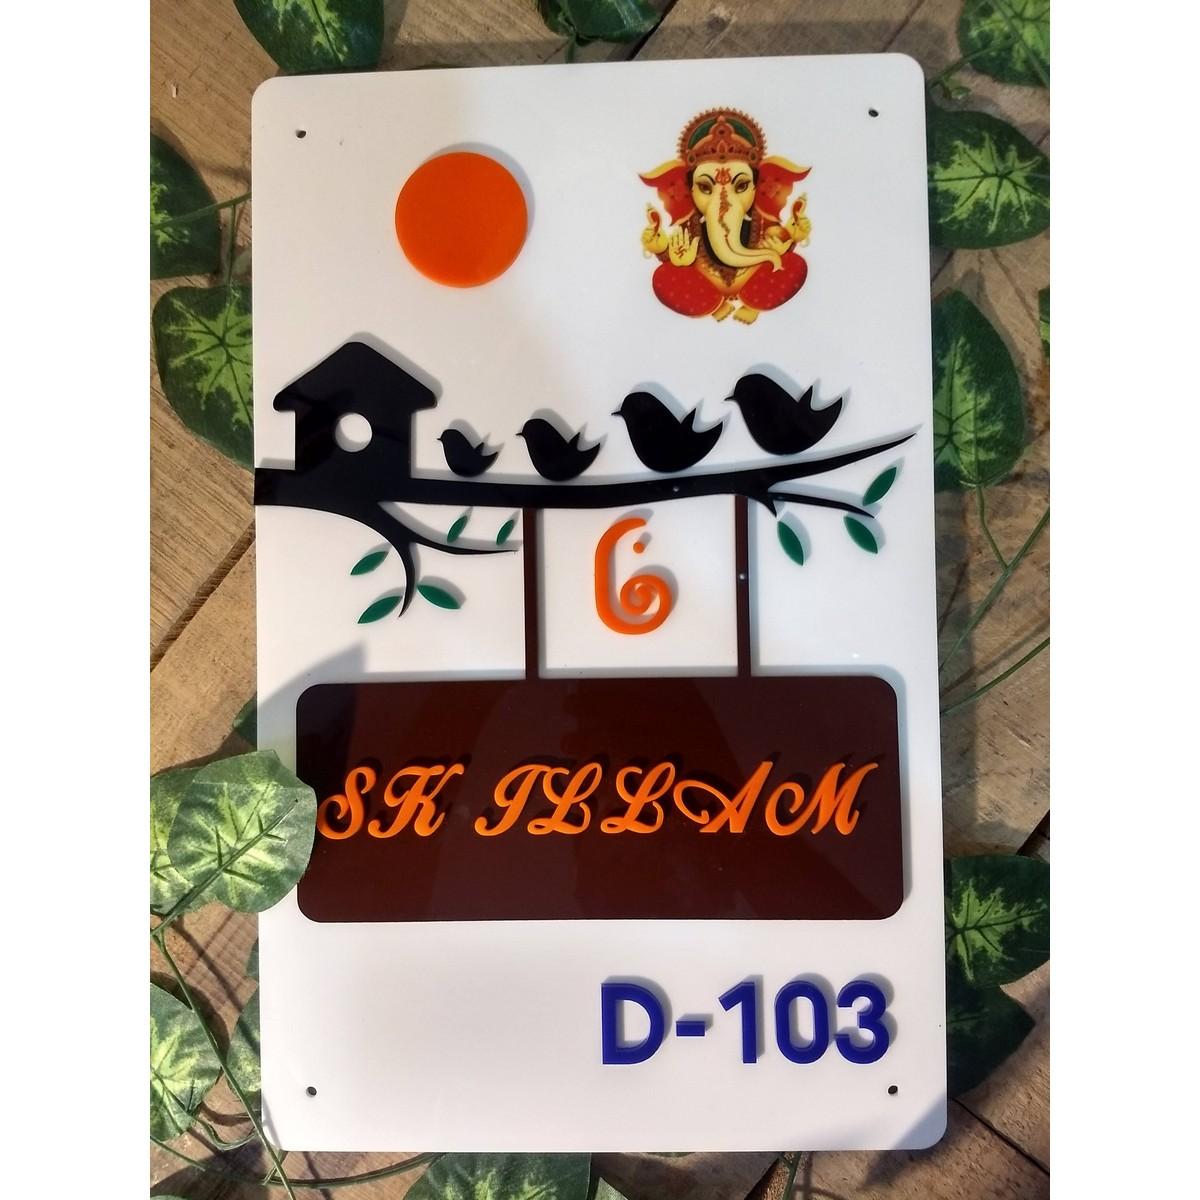 Colorful Acrylic House Name Plate  Colorful Acrylic Name Plate